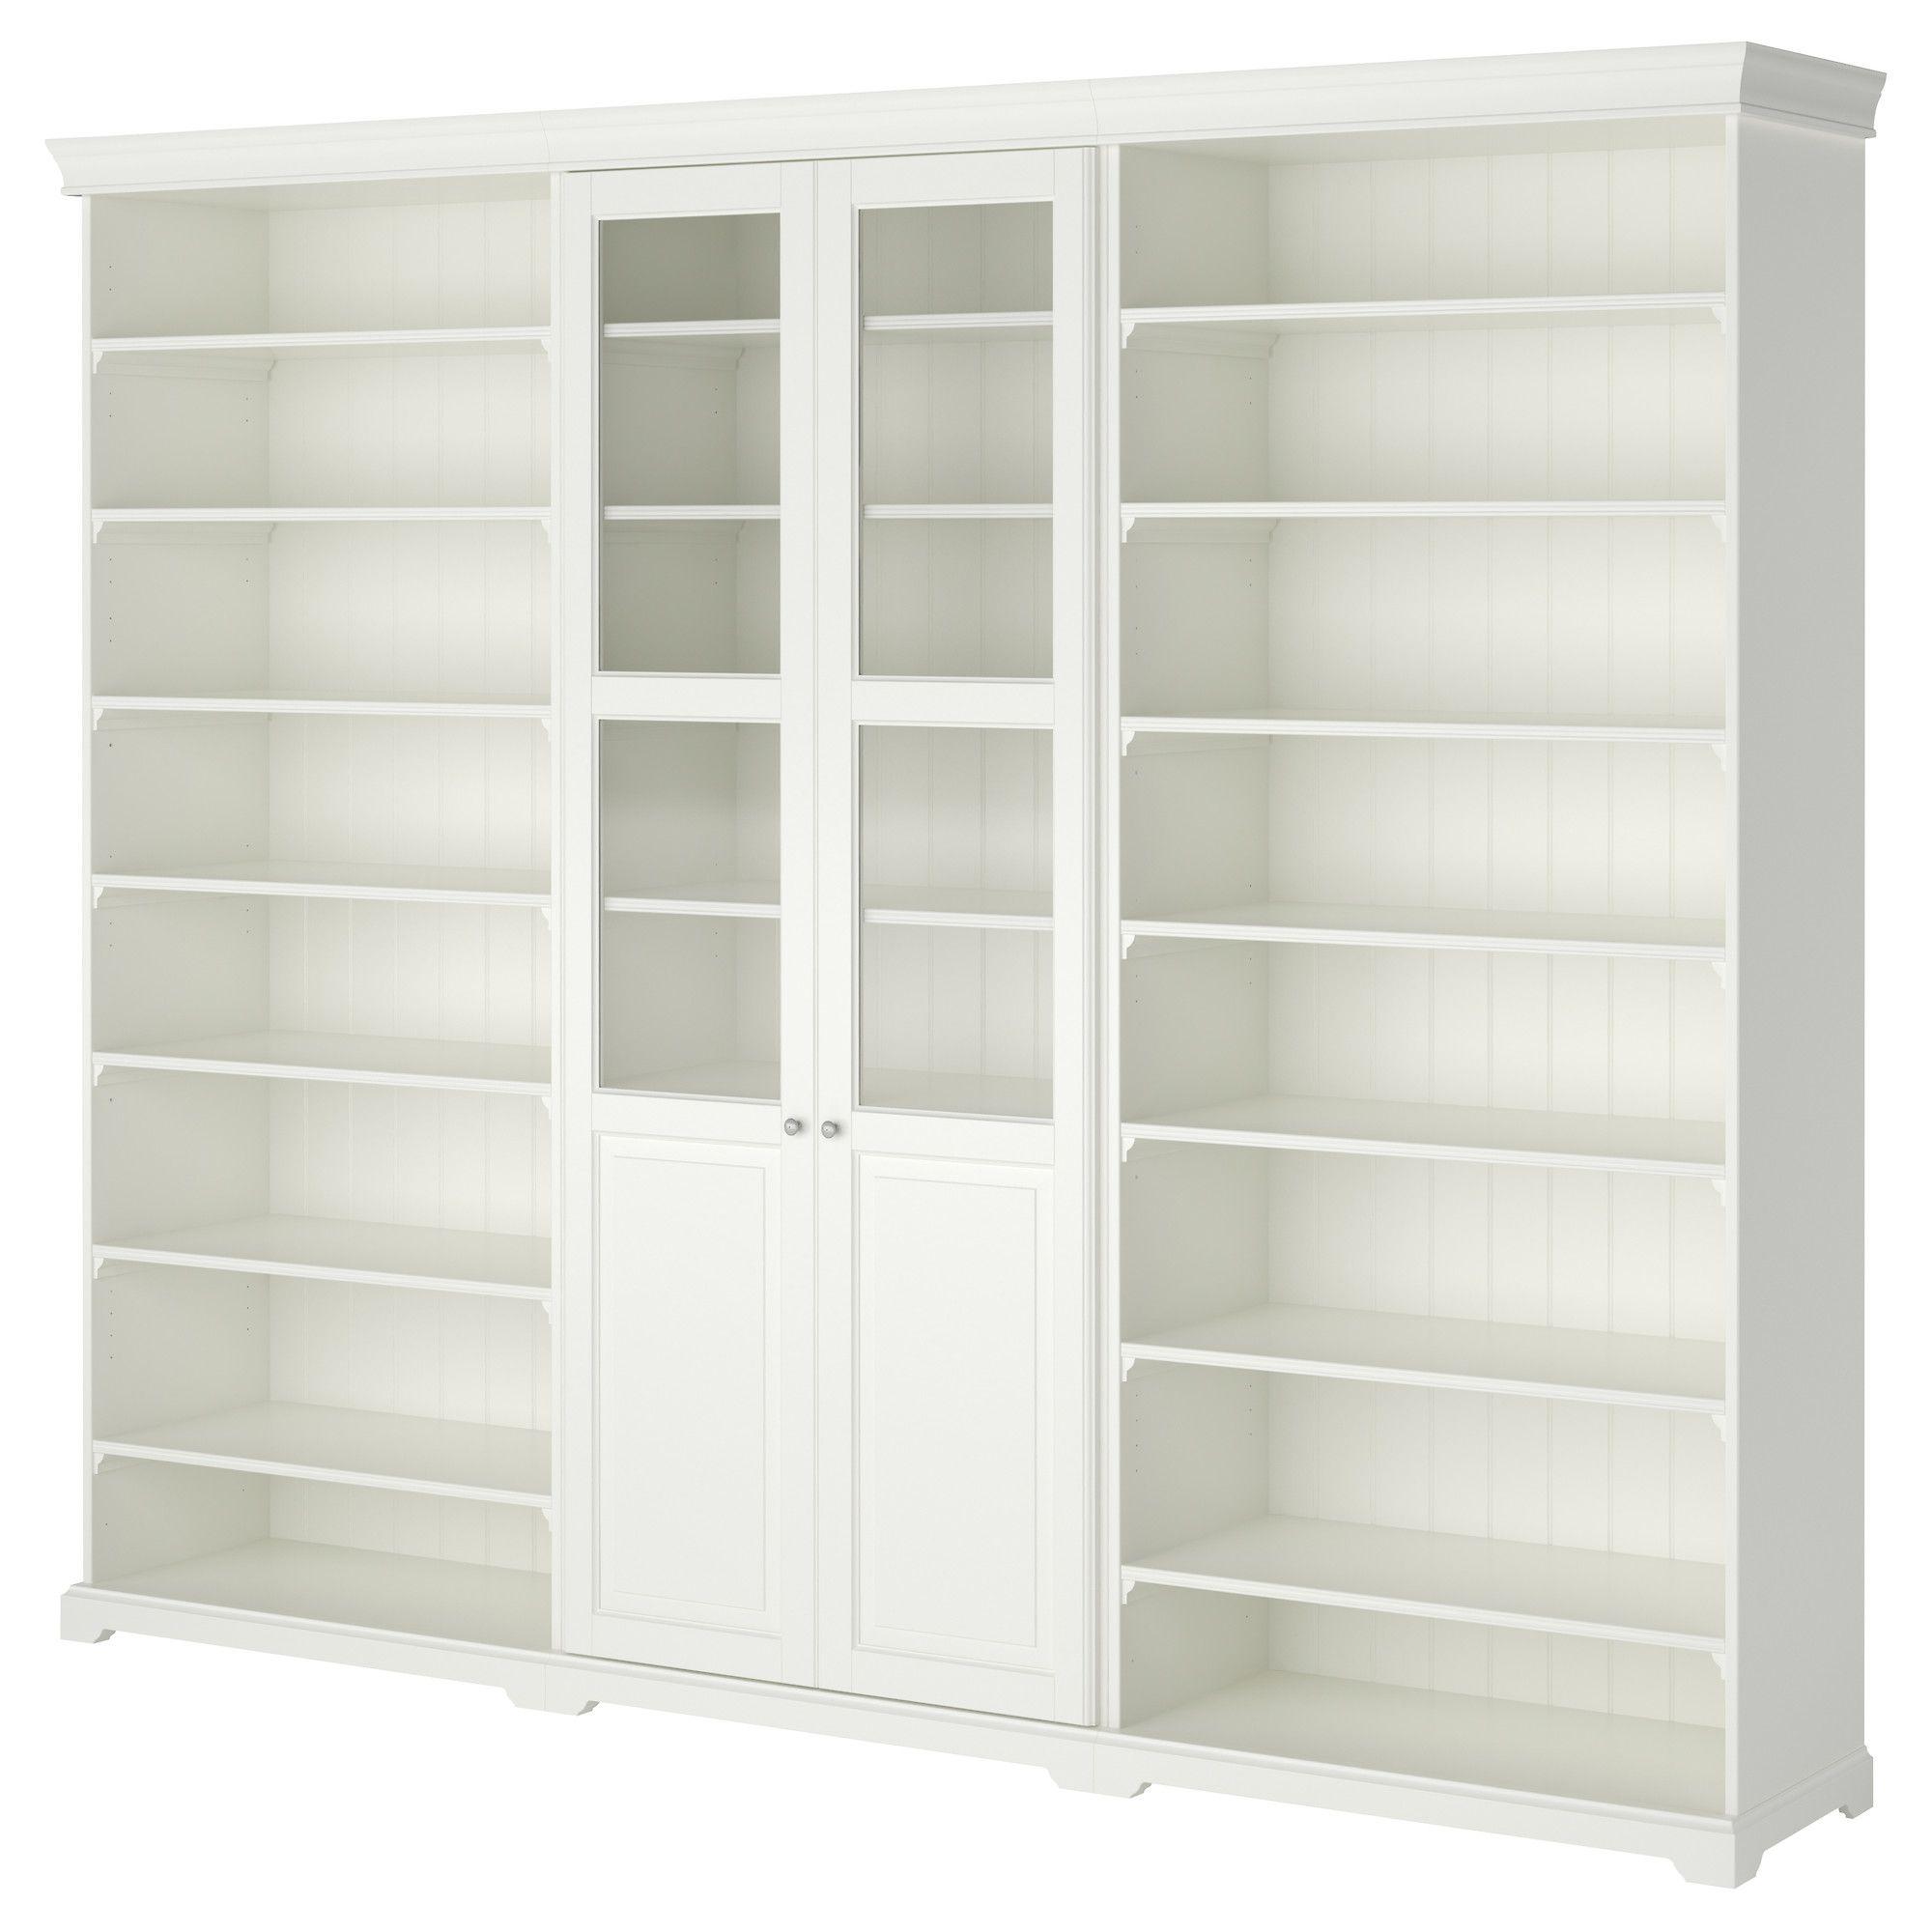 Liatorp storage combination white liatorp ikea craft - Regalwand ikea ...